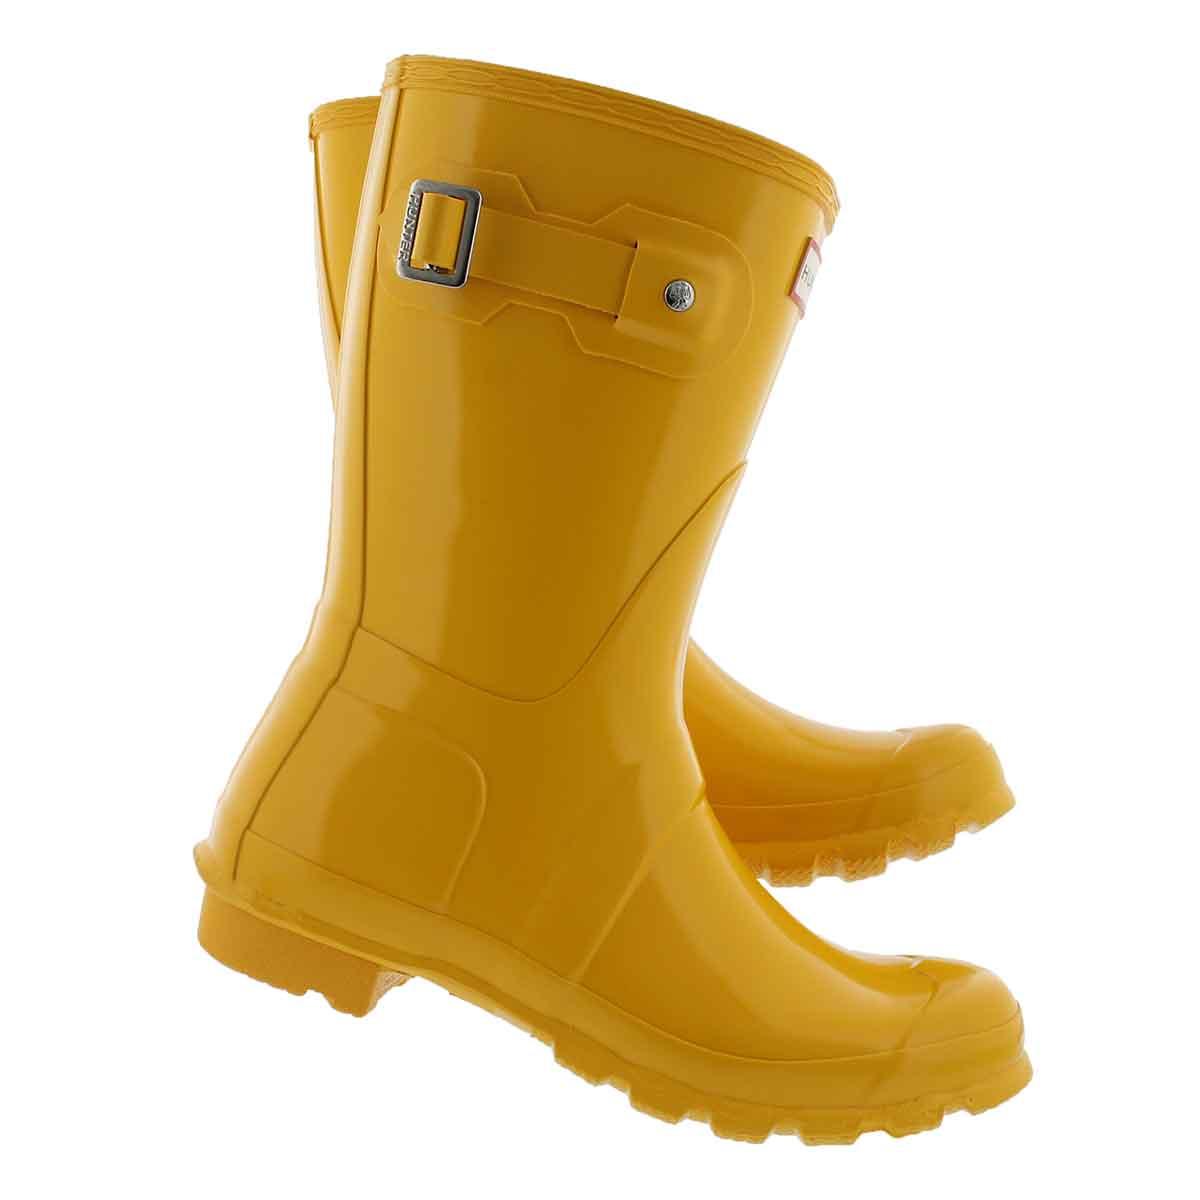 Lds Original Short Gloss yellow rainboot